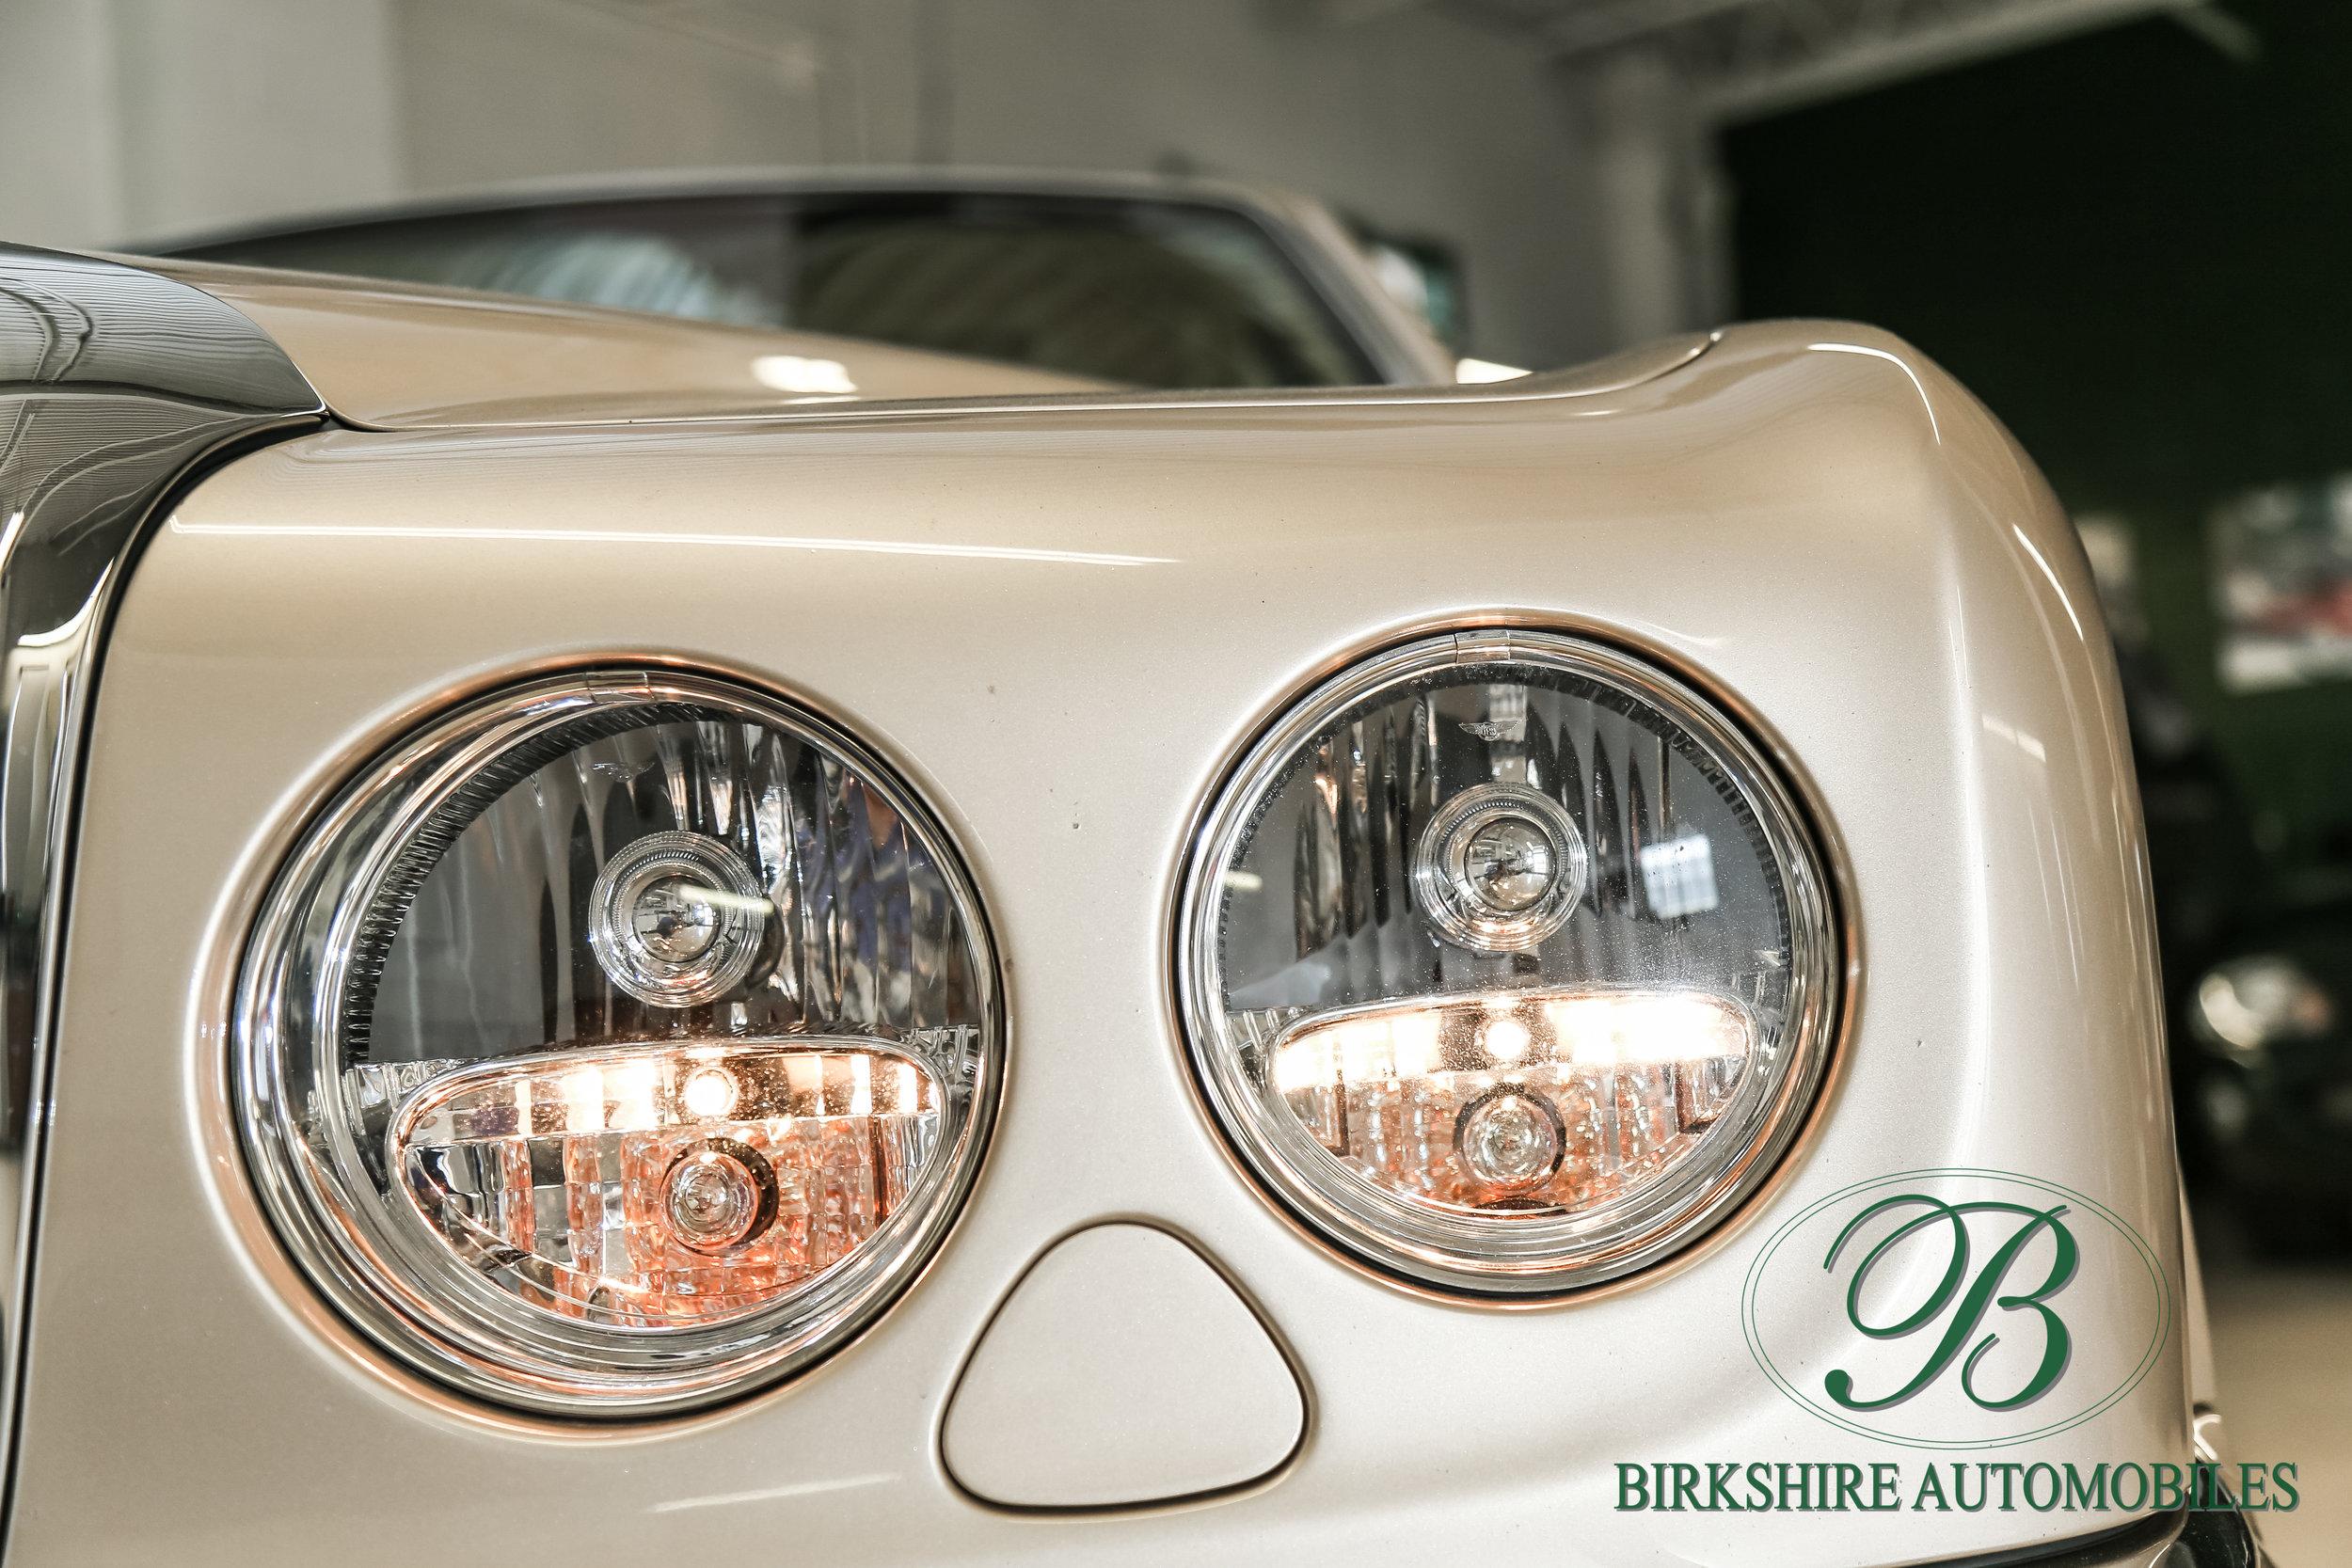 Birkshire Automobiles-339.jpg